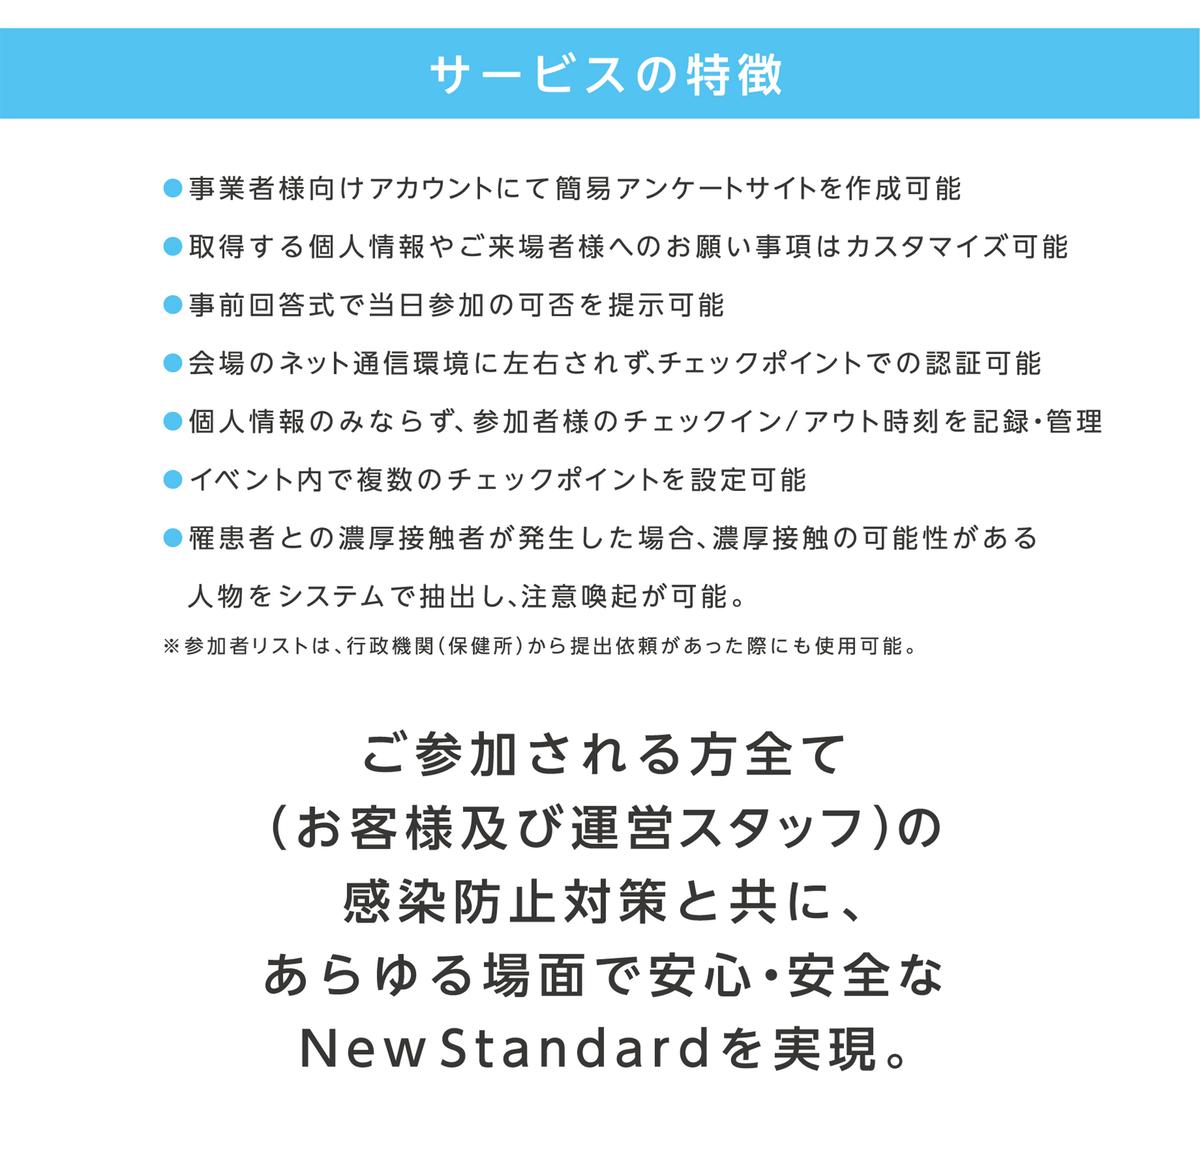 f:id:hpr_sugiyama:20201106101017j:plain